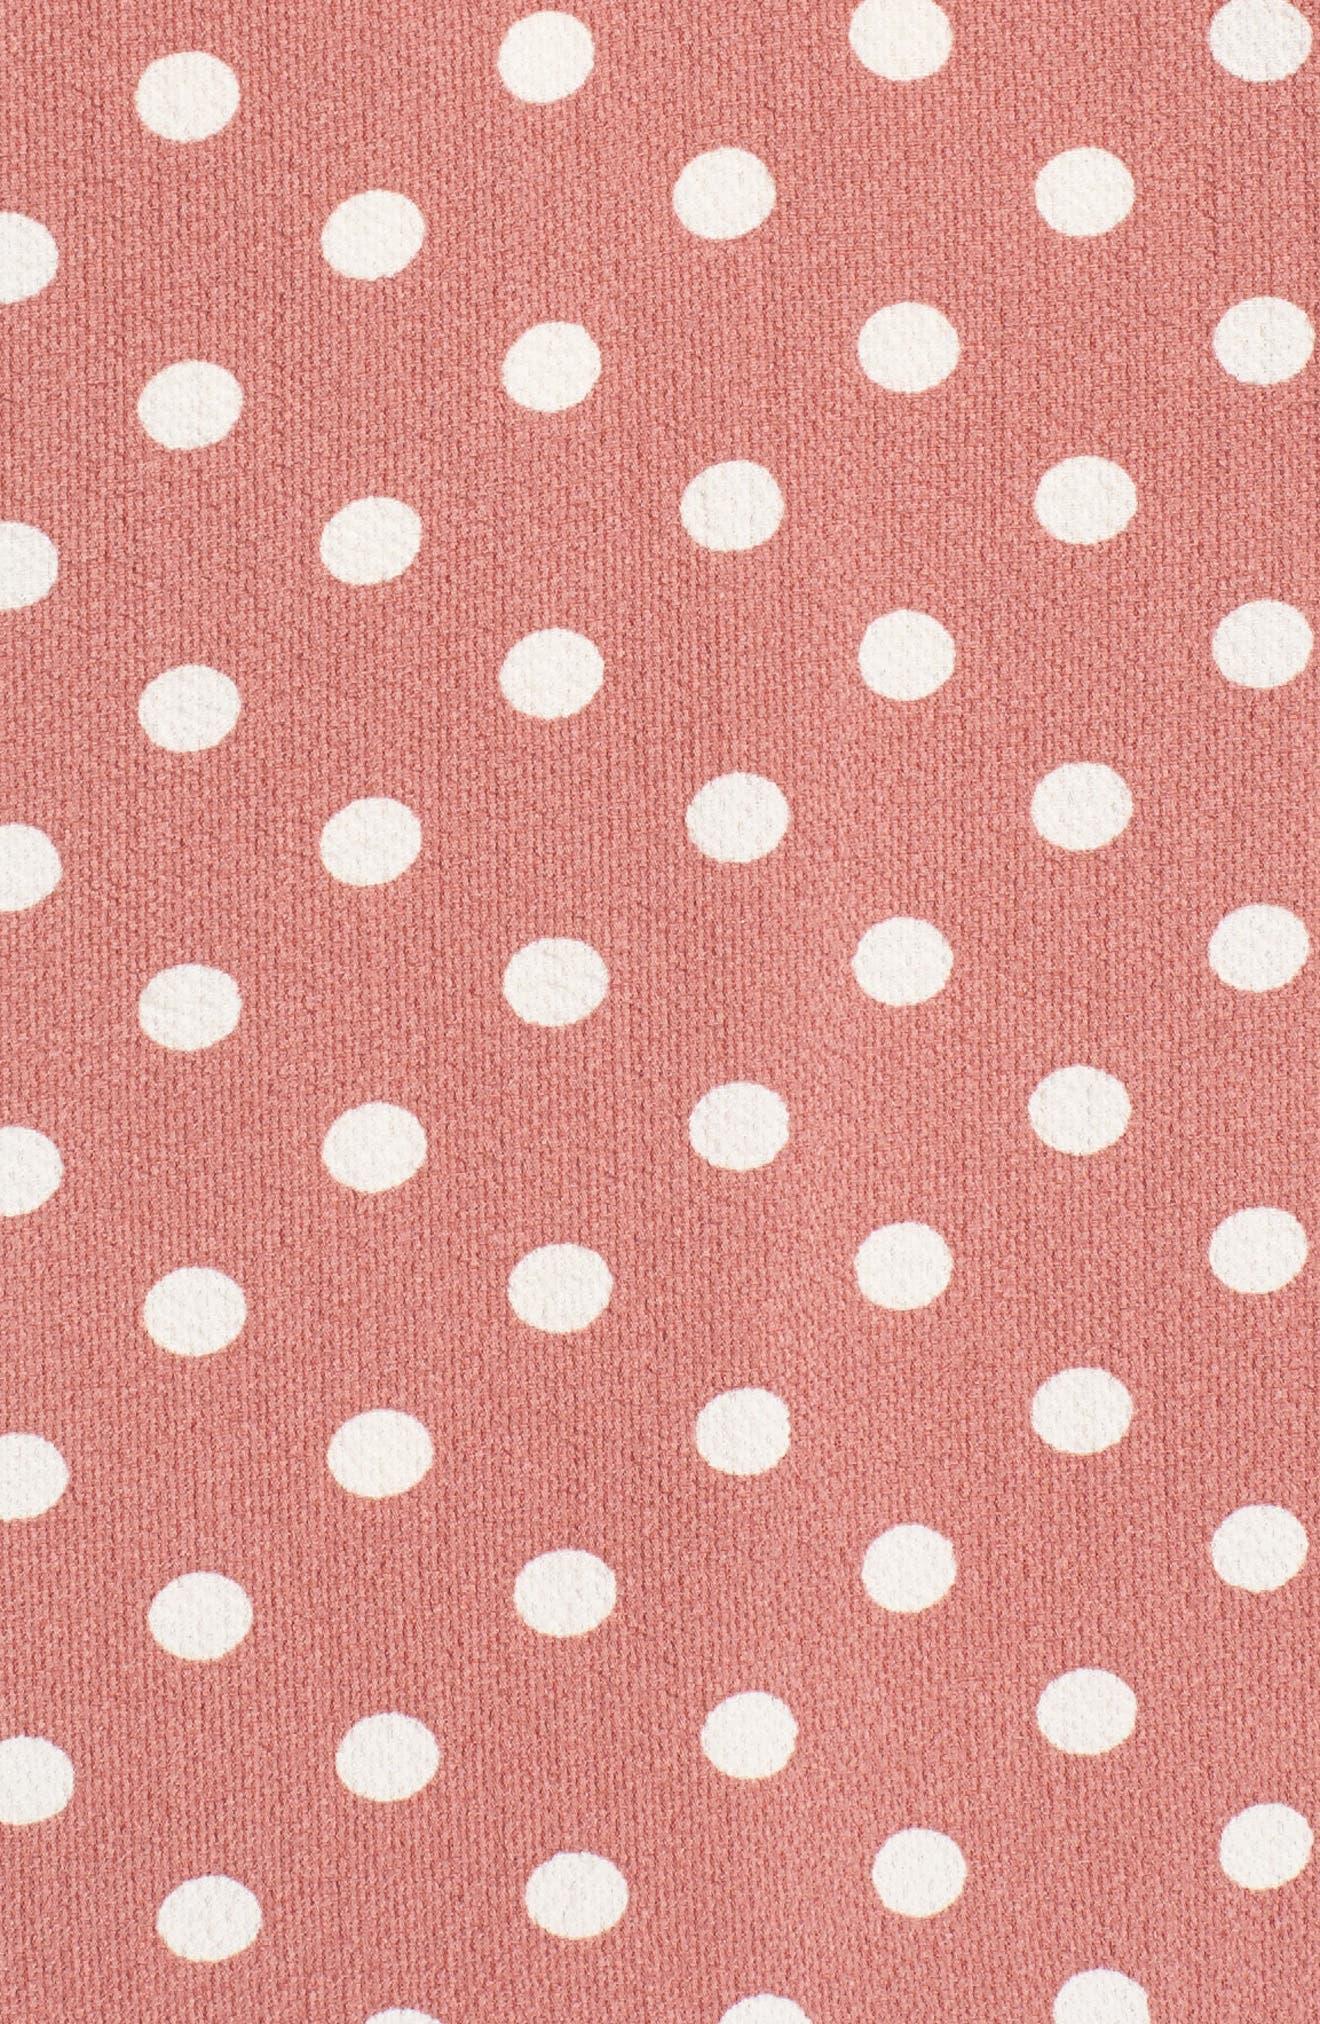 Polka Dot Cold Shoulder Top,                             Alternate thumbnail 5, color,                             Pink Polka Dot